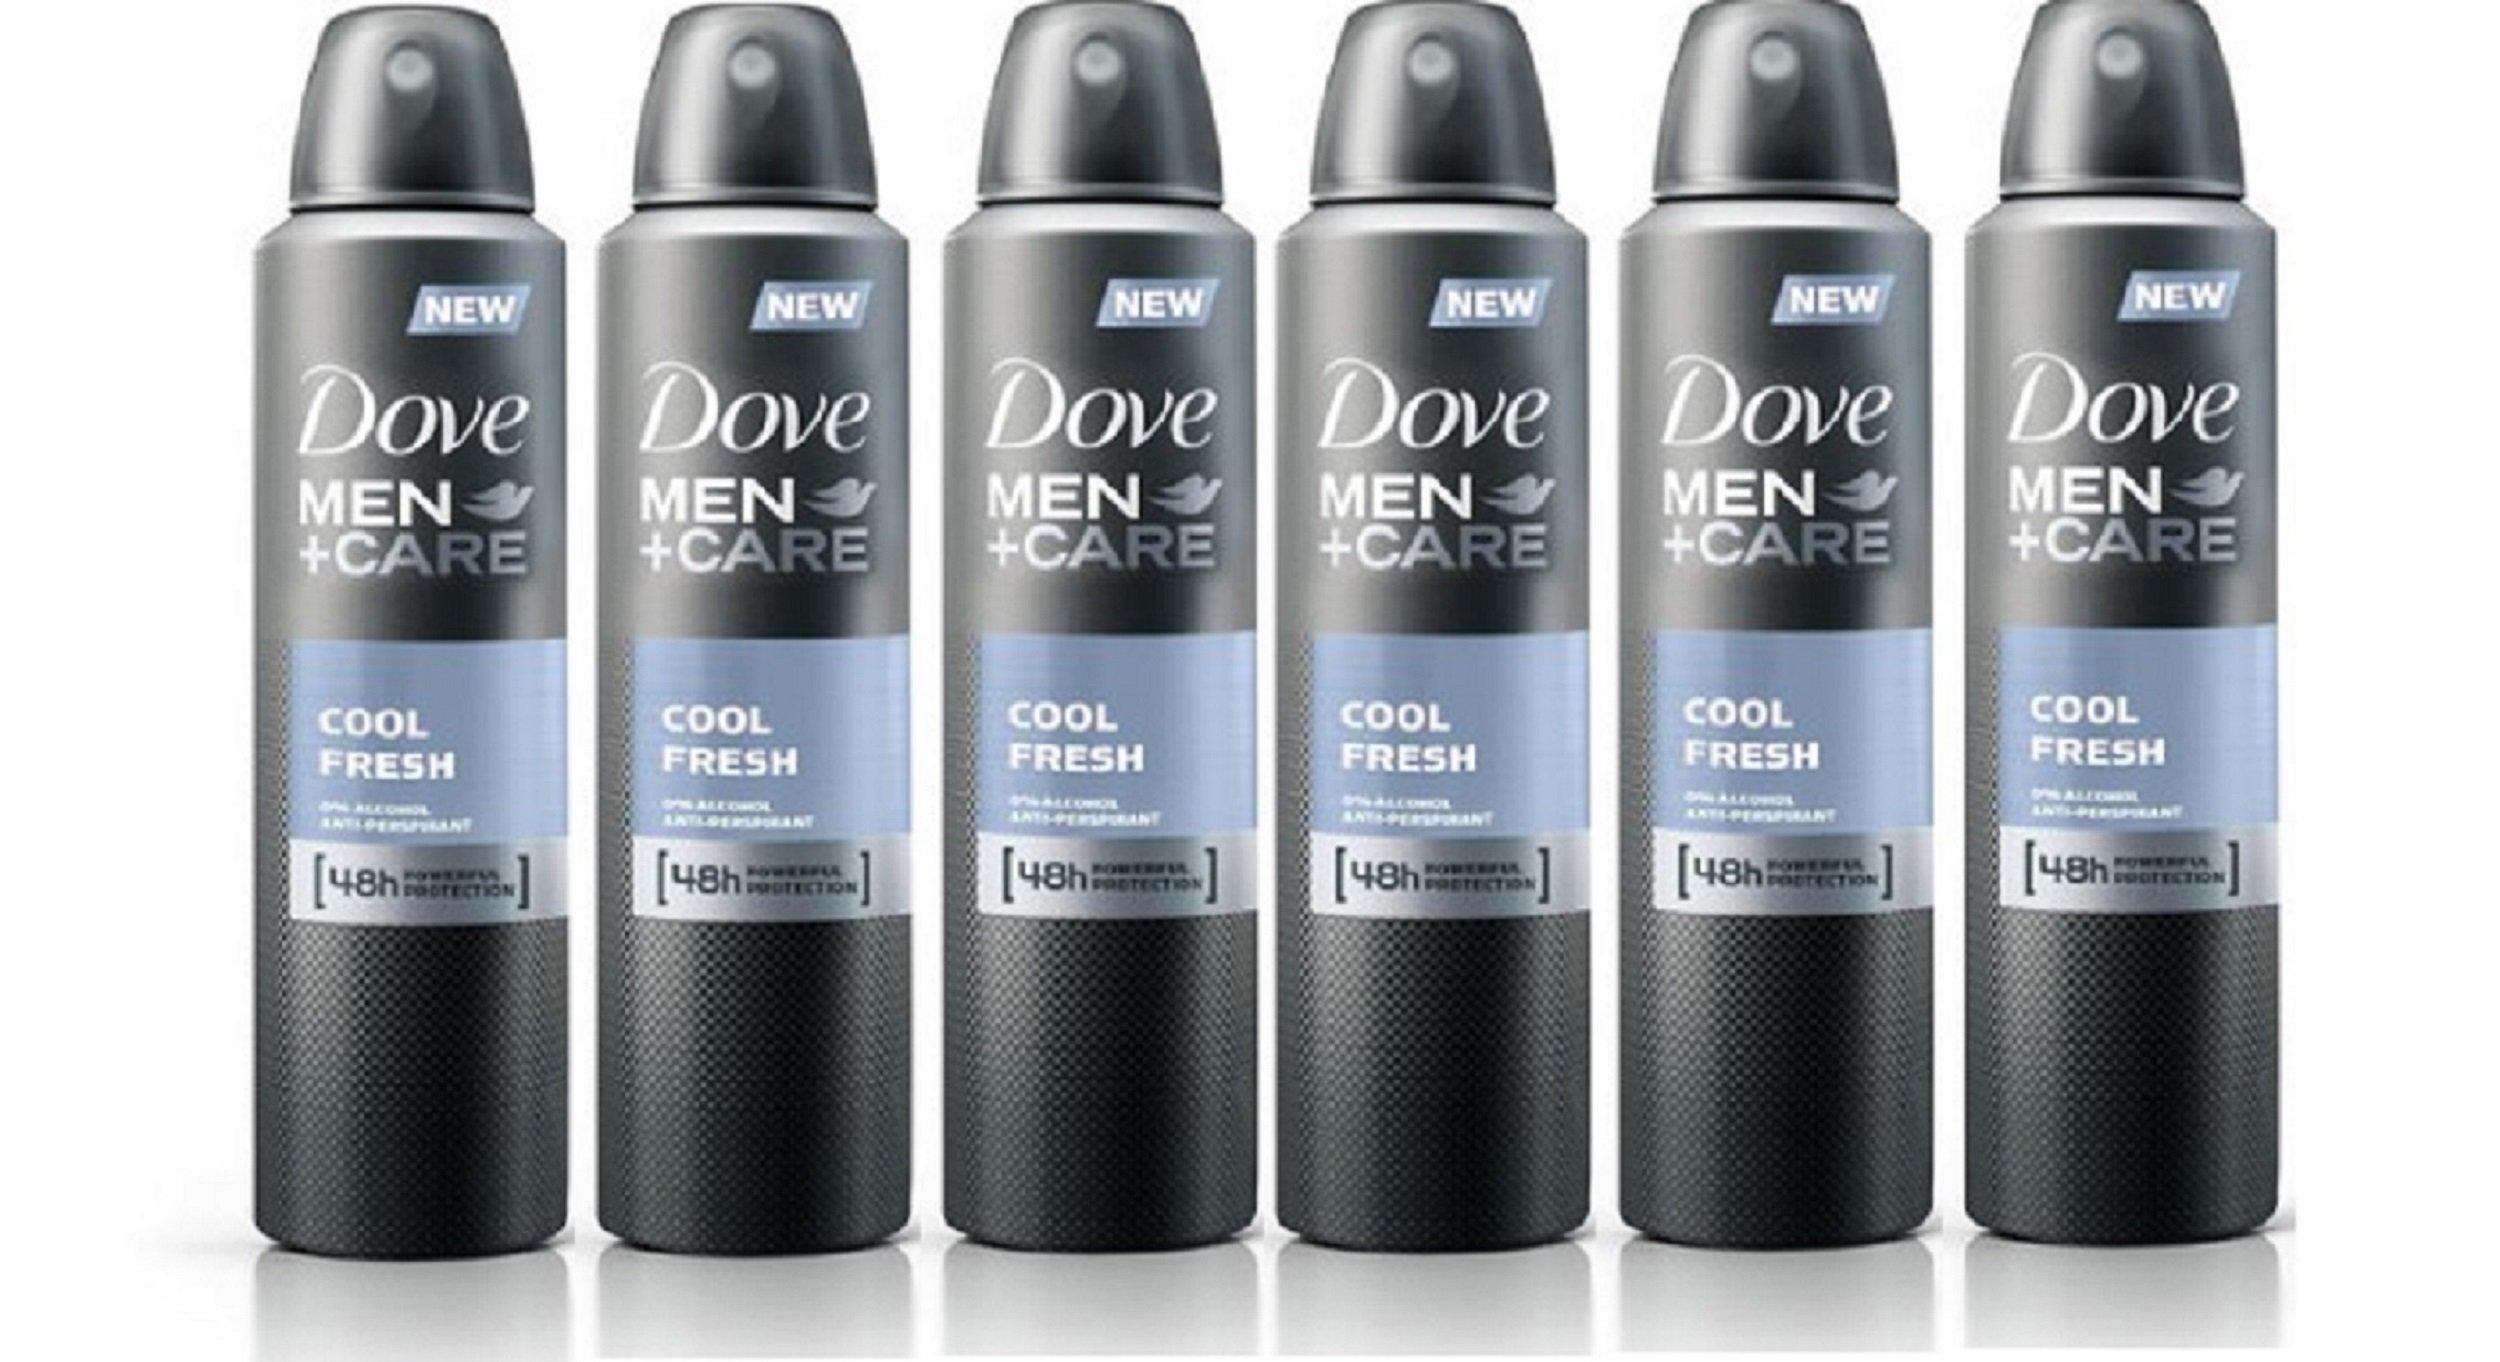 Set of 6 Dove Men + Care Cool Fresh Spray Deodorant & Anti-Perspirant 150ml / 5.07 Oz